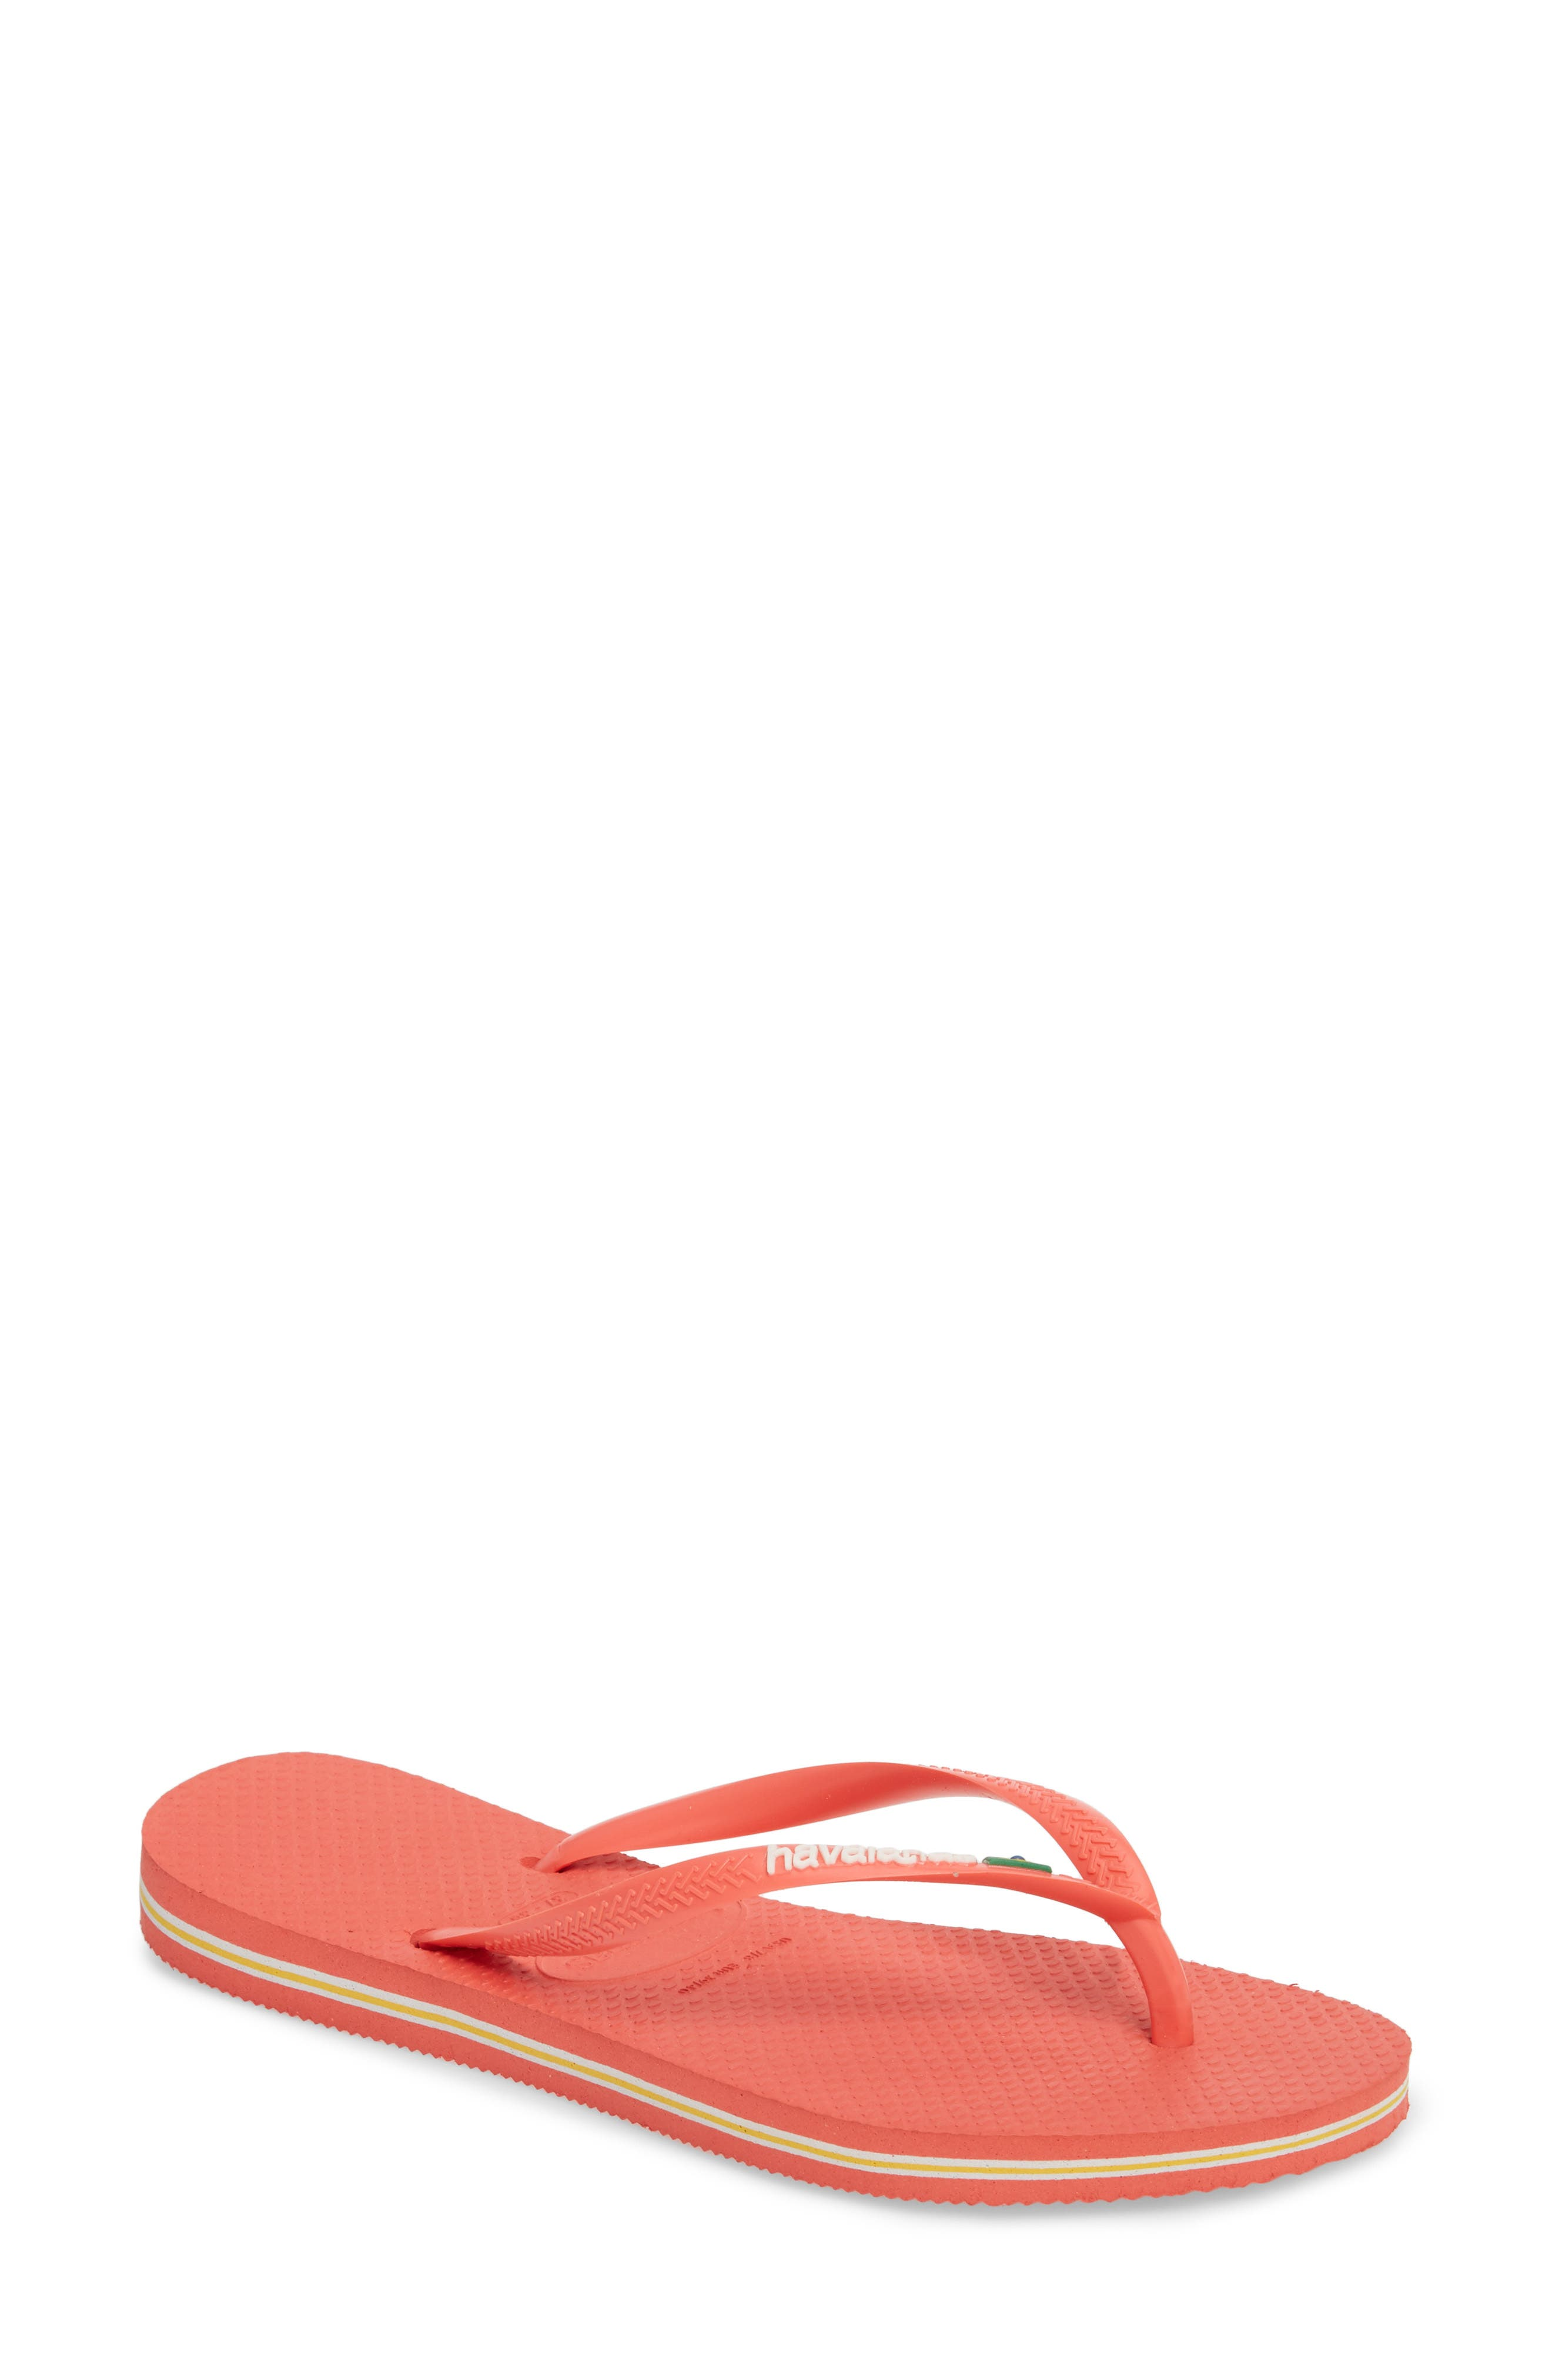 Havianas Slim Brazil Flip Flop,                             Main thumbnail 1, color,                             Coral